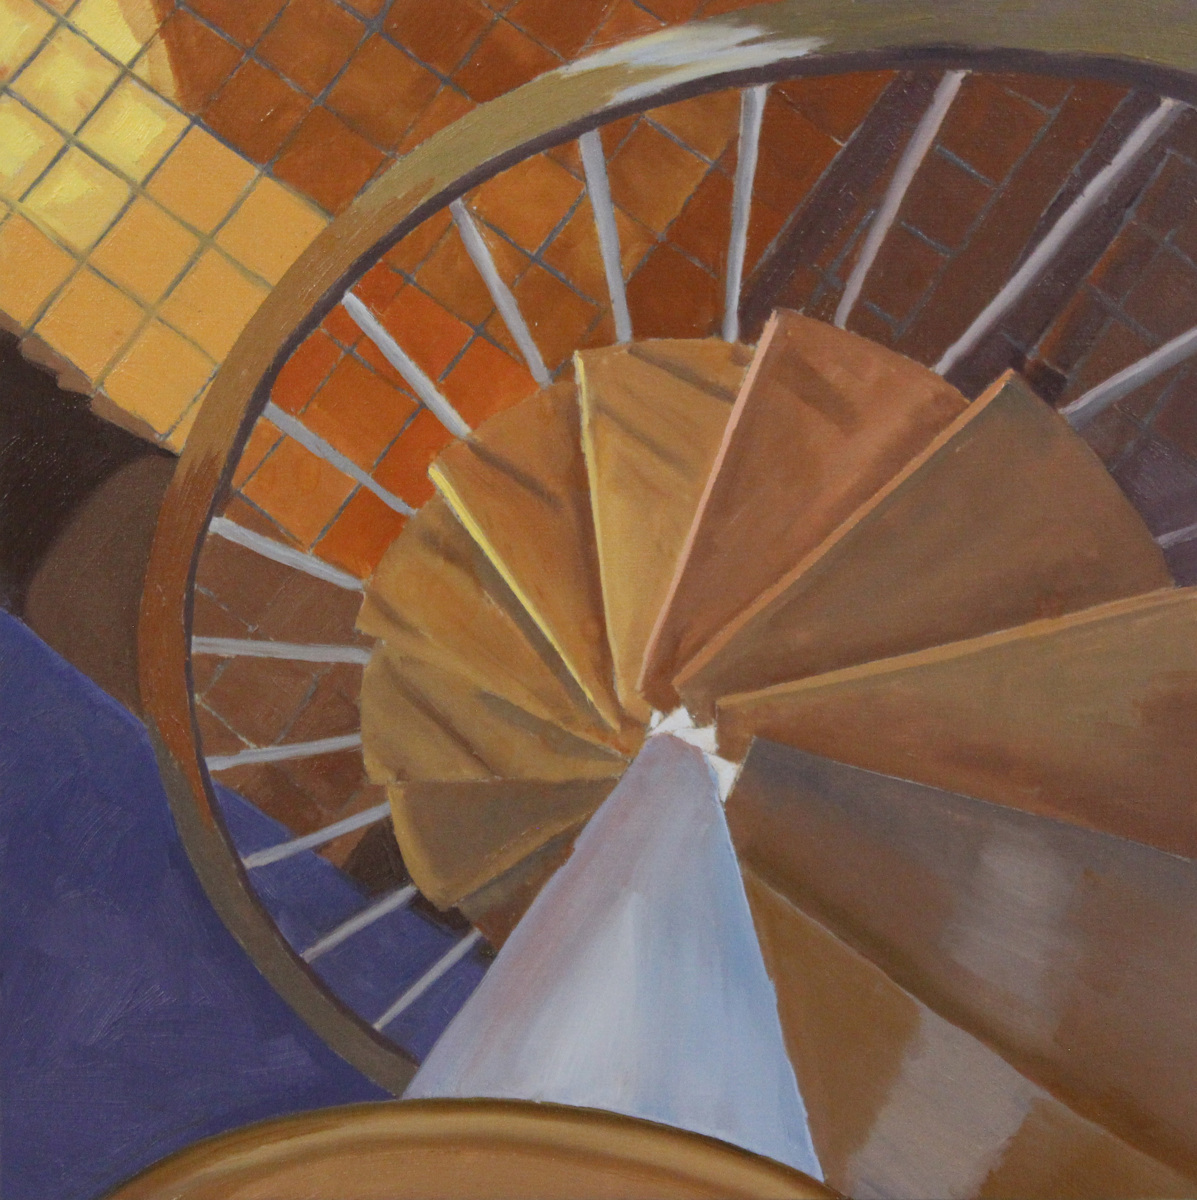 Downward Spiral (large view)